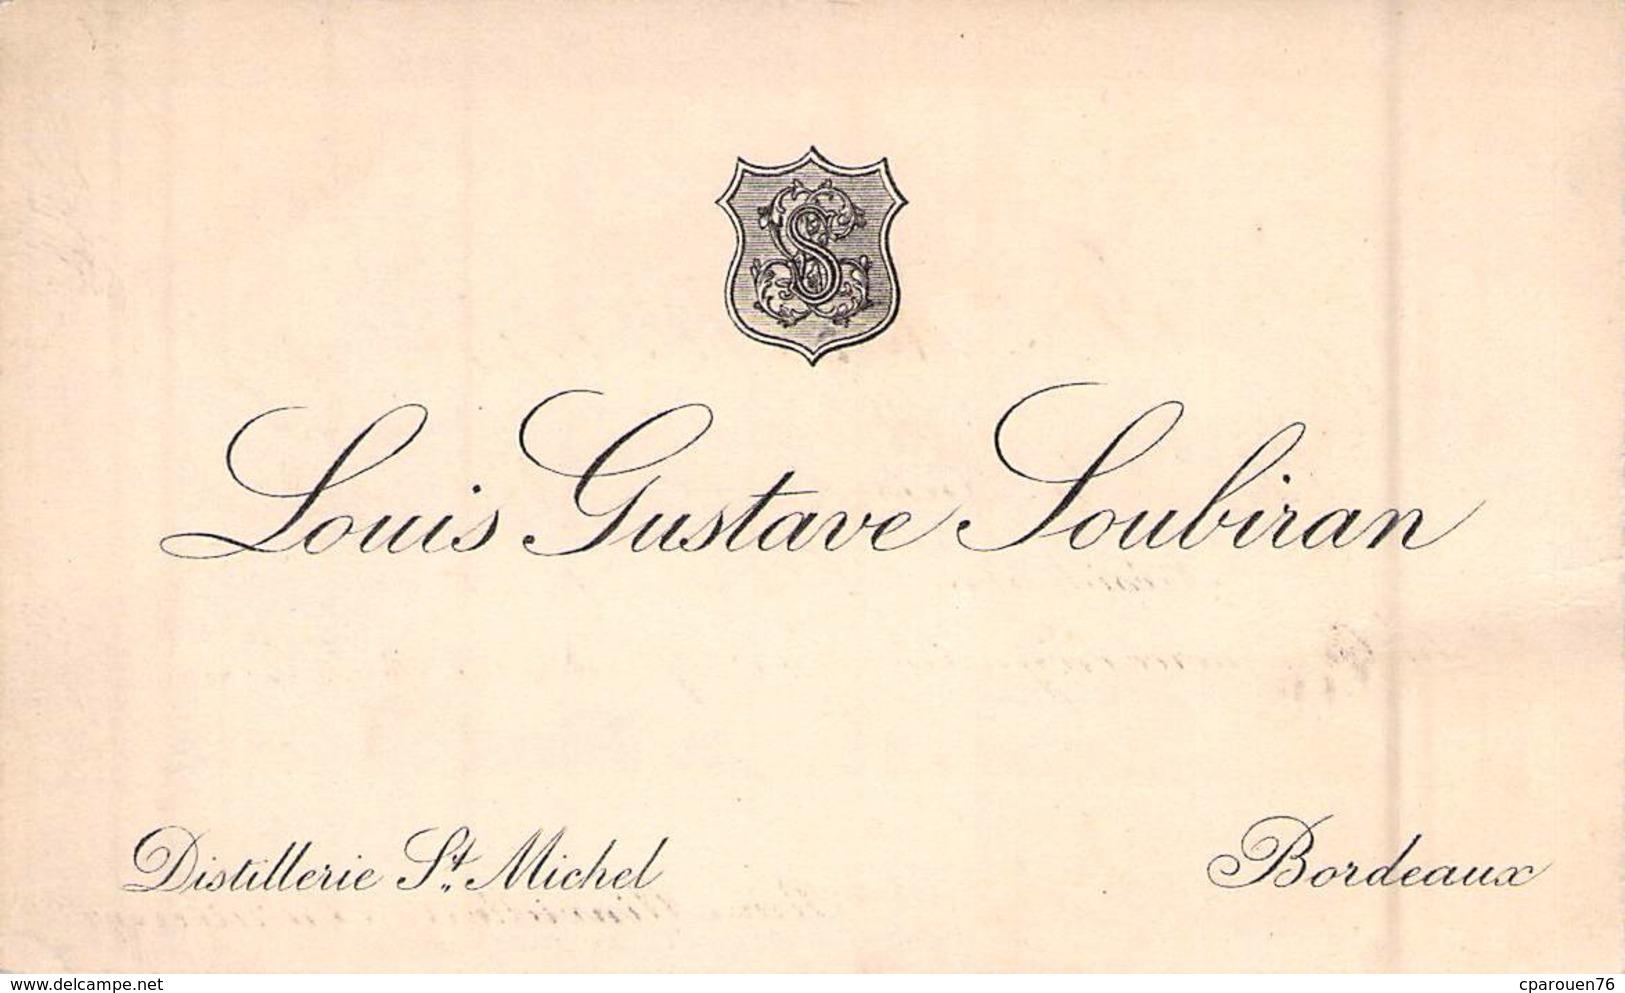 Carte De Visite De  Mr Louis Gustave Soubiran Distillerie St Michel Bordeaux - Cartoncini Da Visita